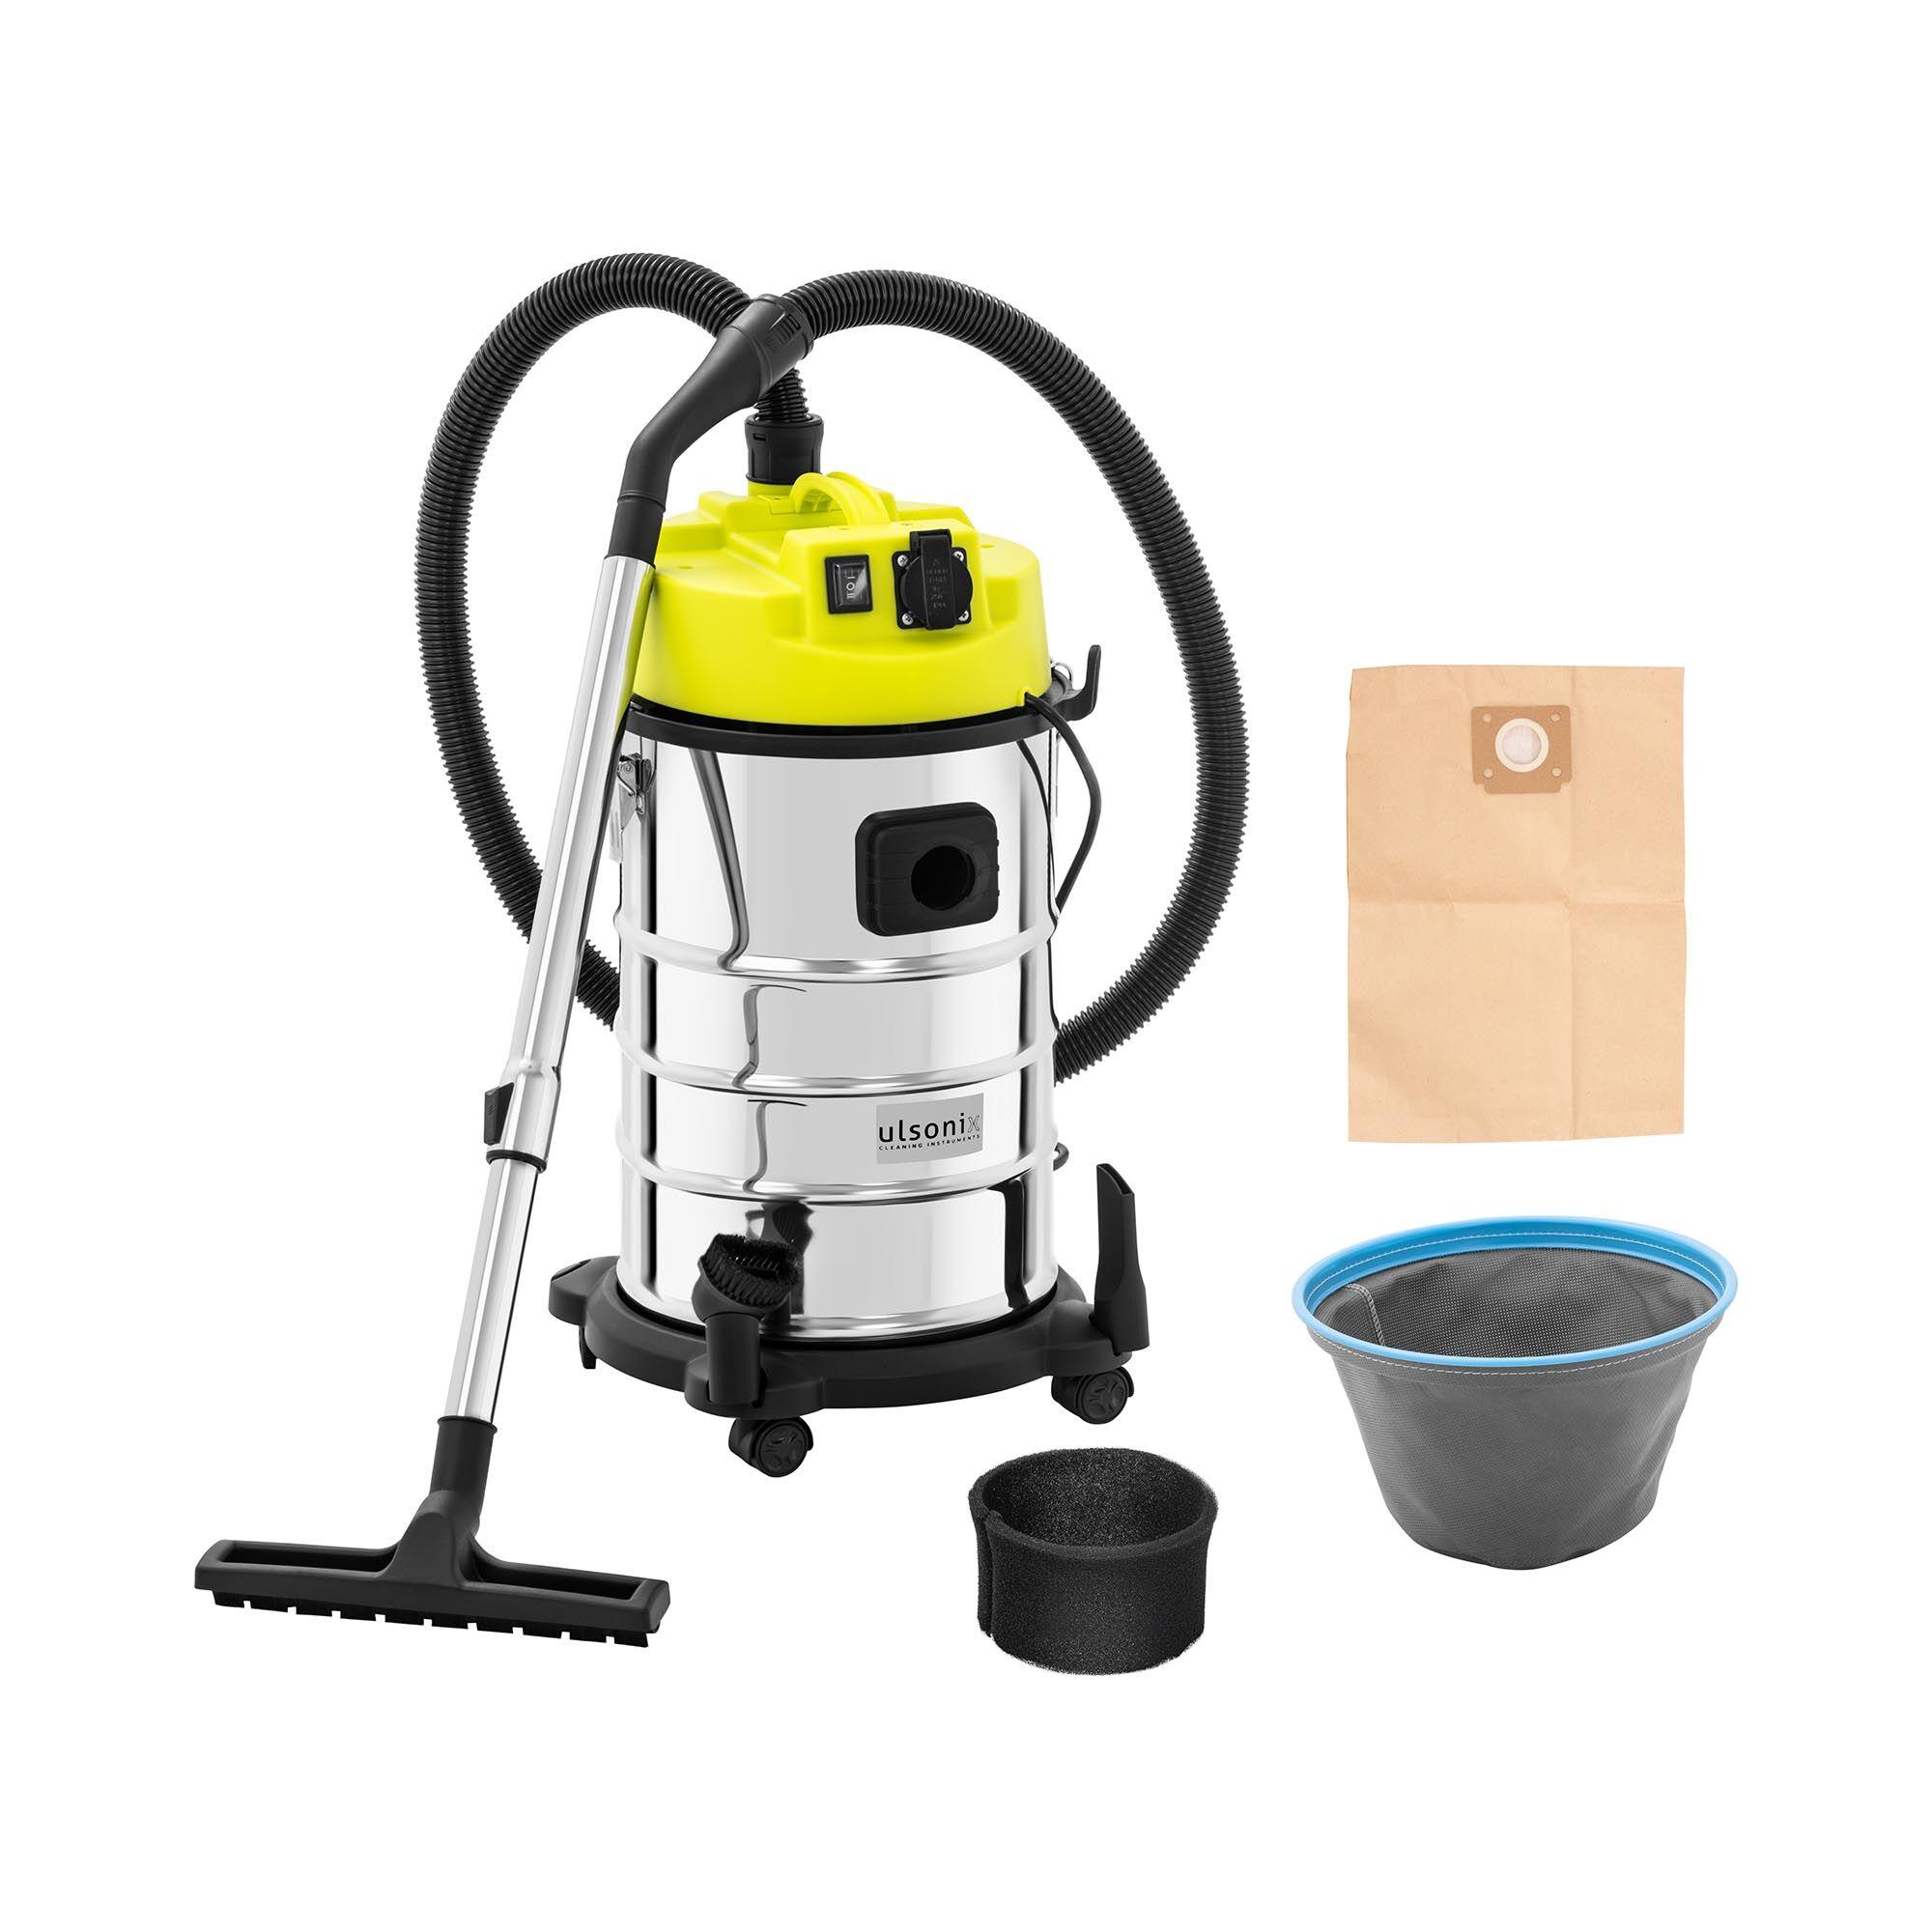 ulsonix Wet/Dry Vacuum Cleaner - 1,400 W - 30 L - socket FLOORCLEAN 30FS